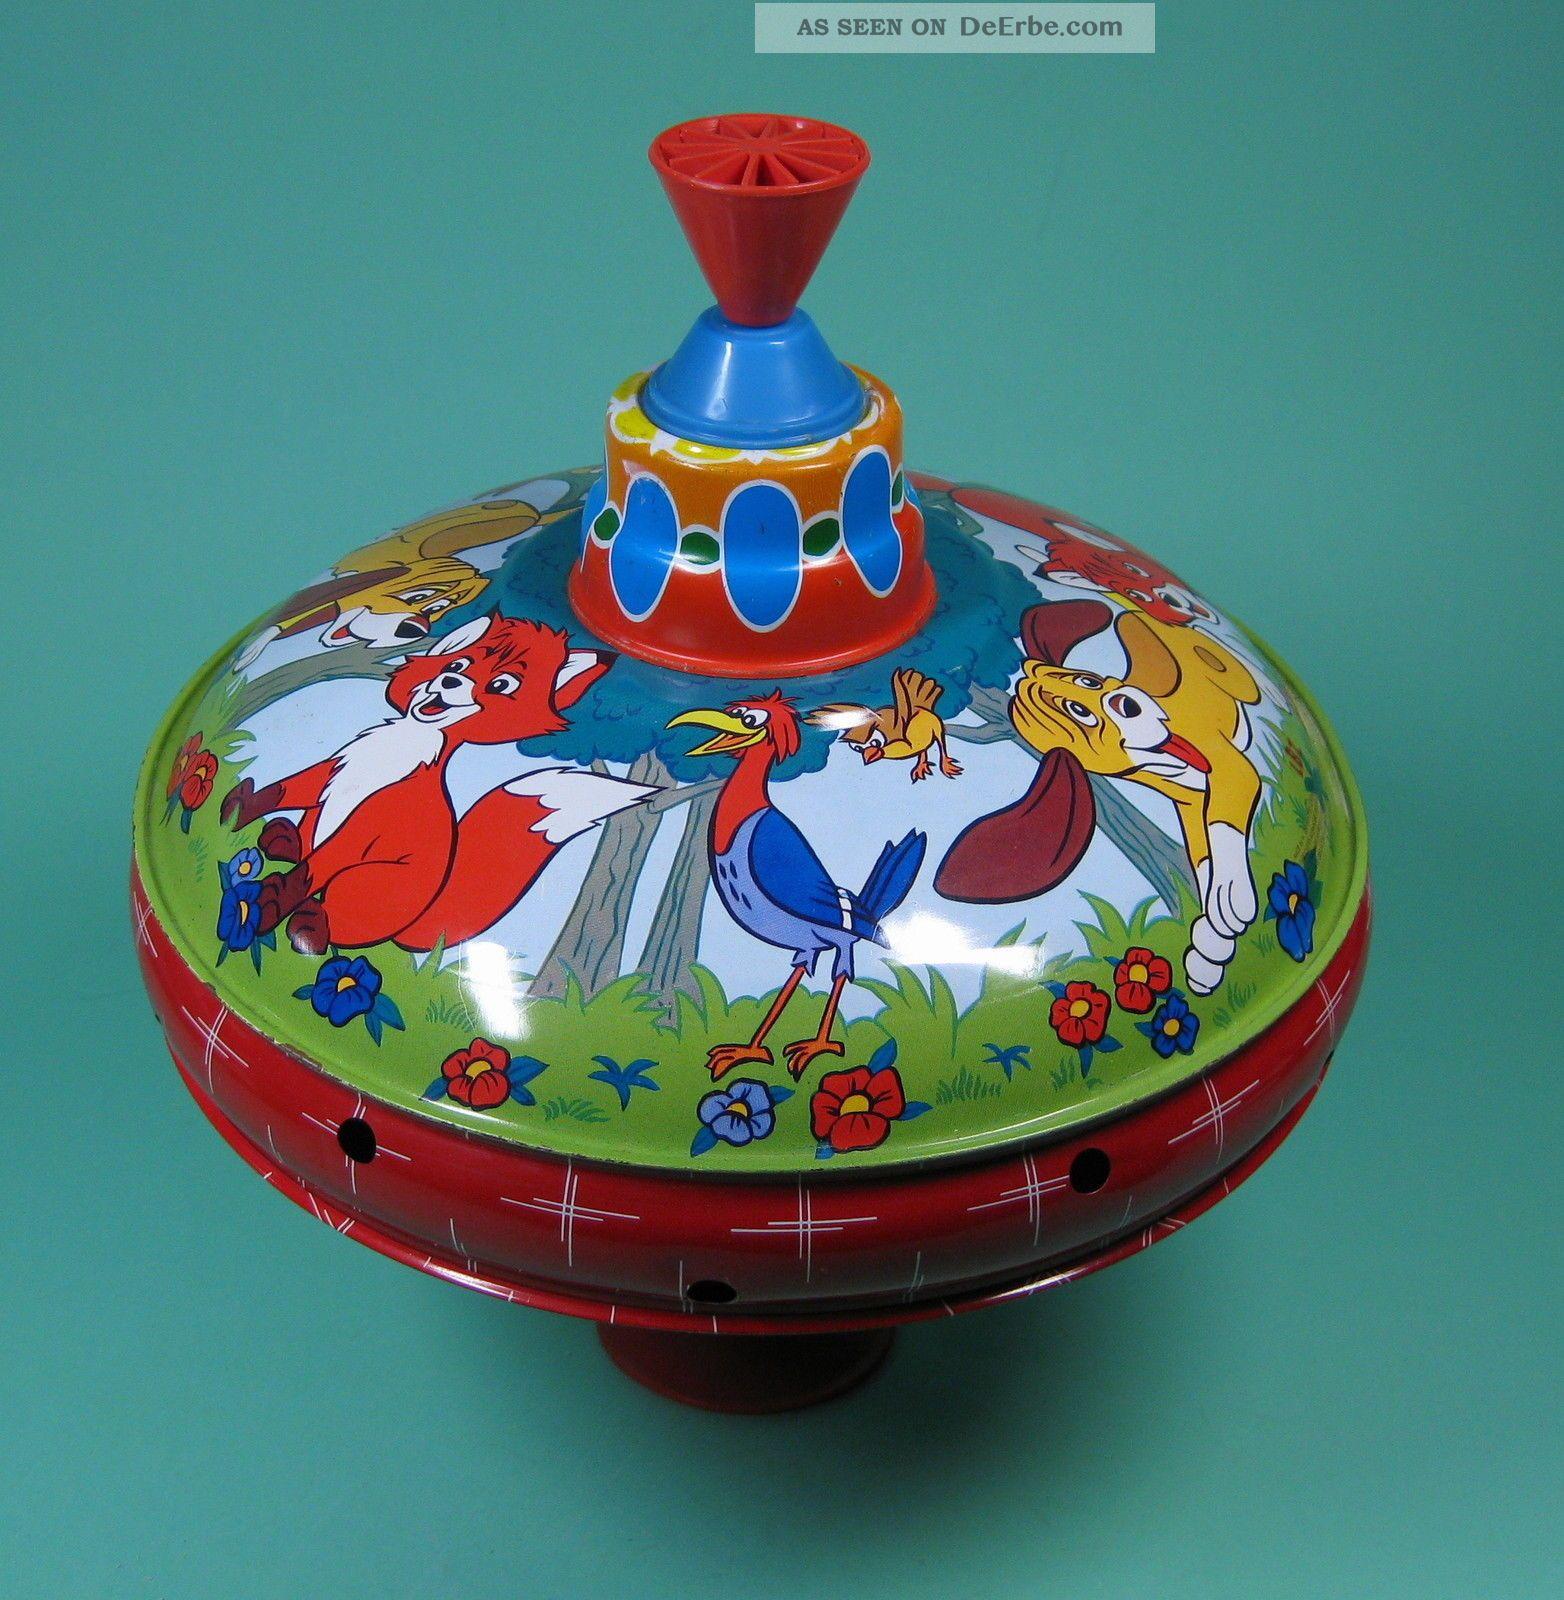 Blechkreisel Walt Disney Brumm Kreisel Lbz Top 70er Made In Germany Original, gefertigt 1945-1970 Bild